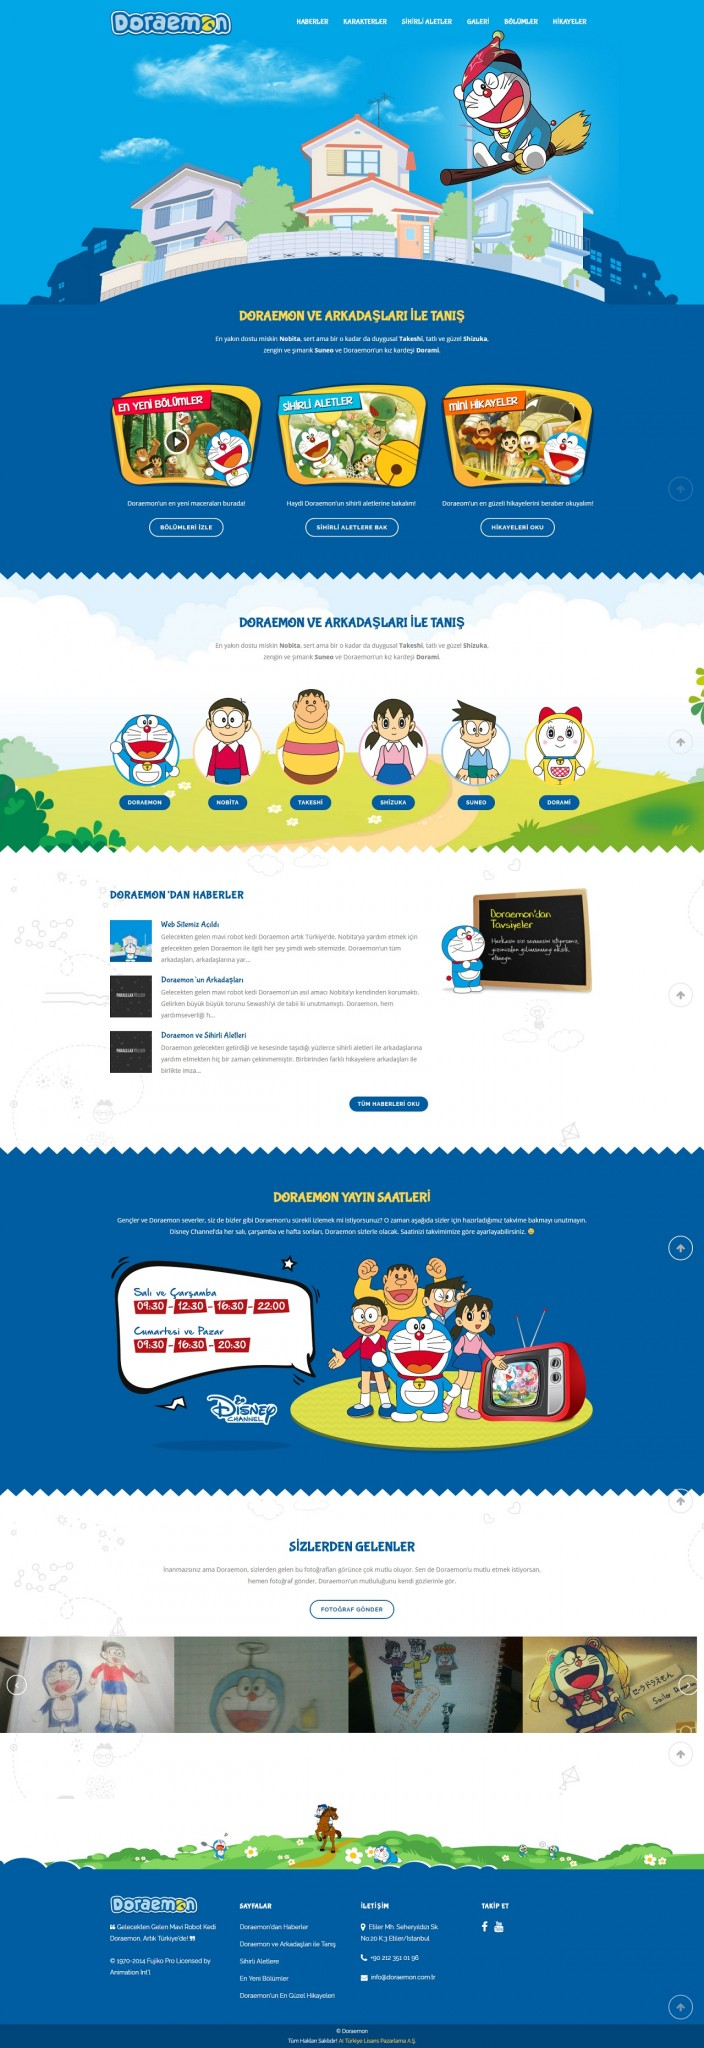 Doraemon Web Page Design Purple Pan